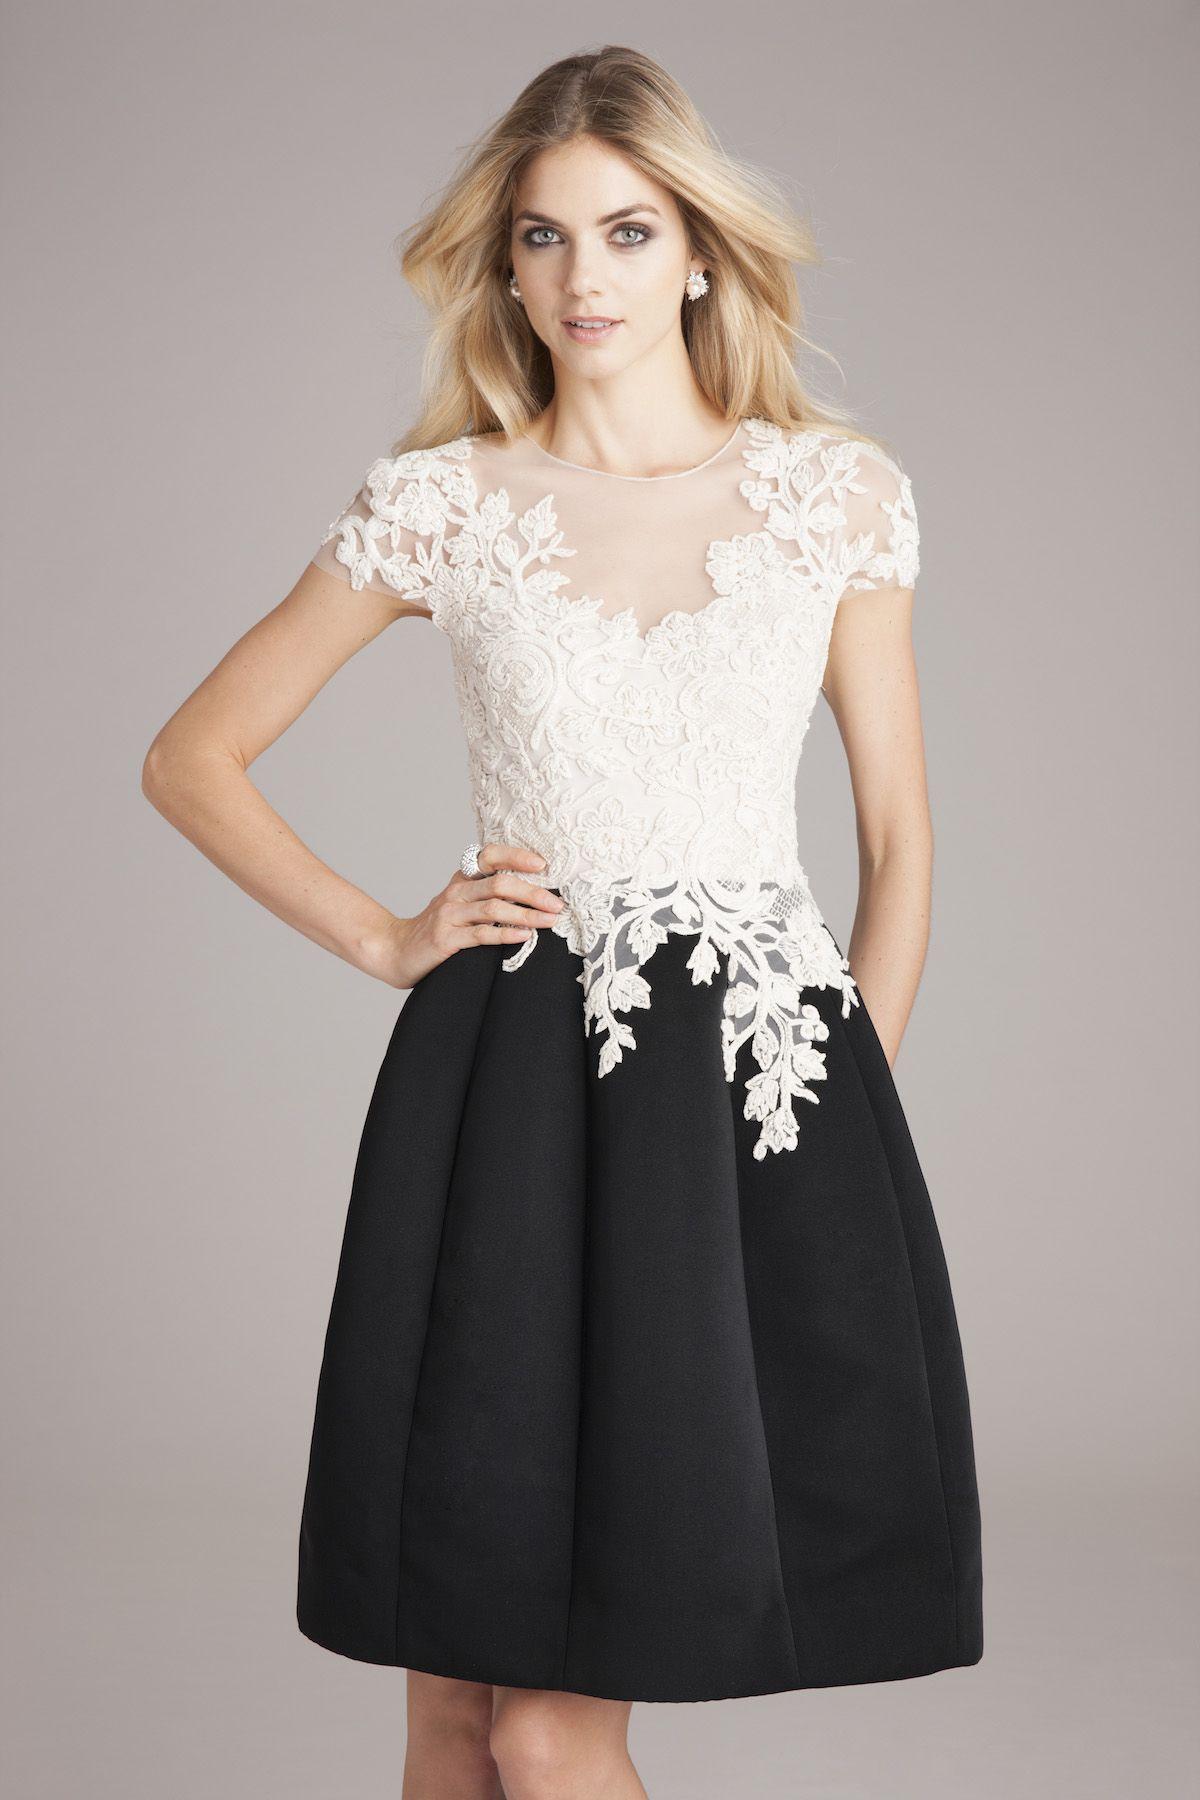 Gorgeous Black And White Designer Dress White Lace Top Silk